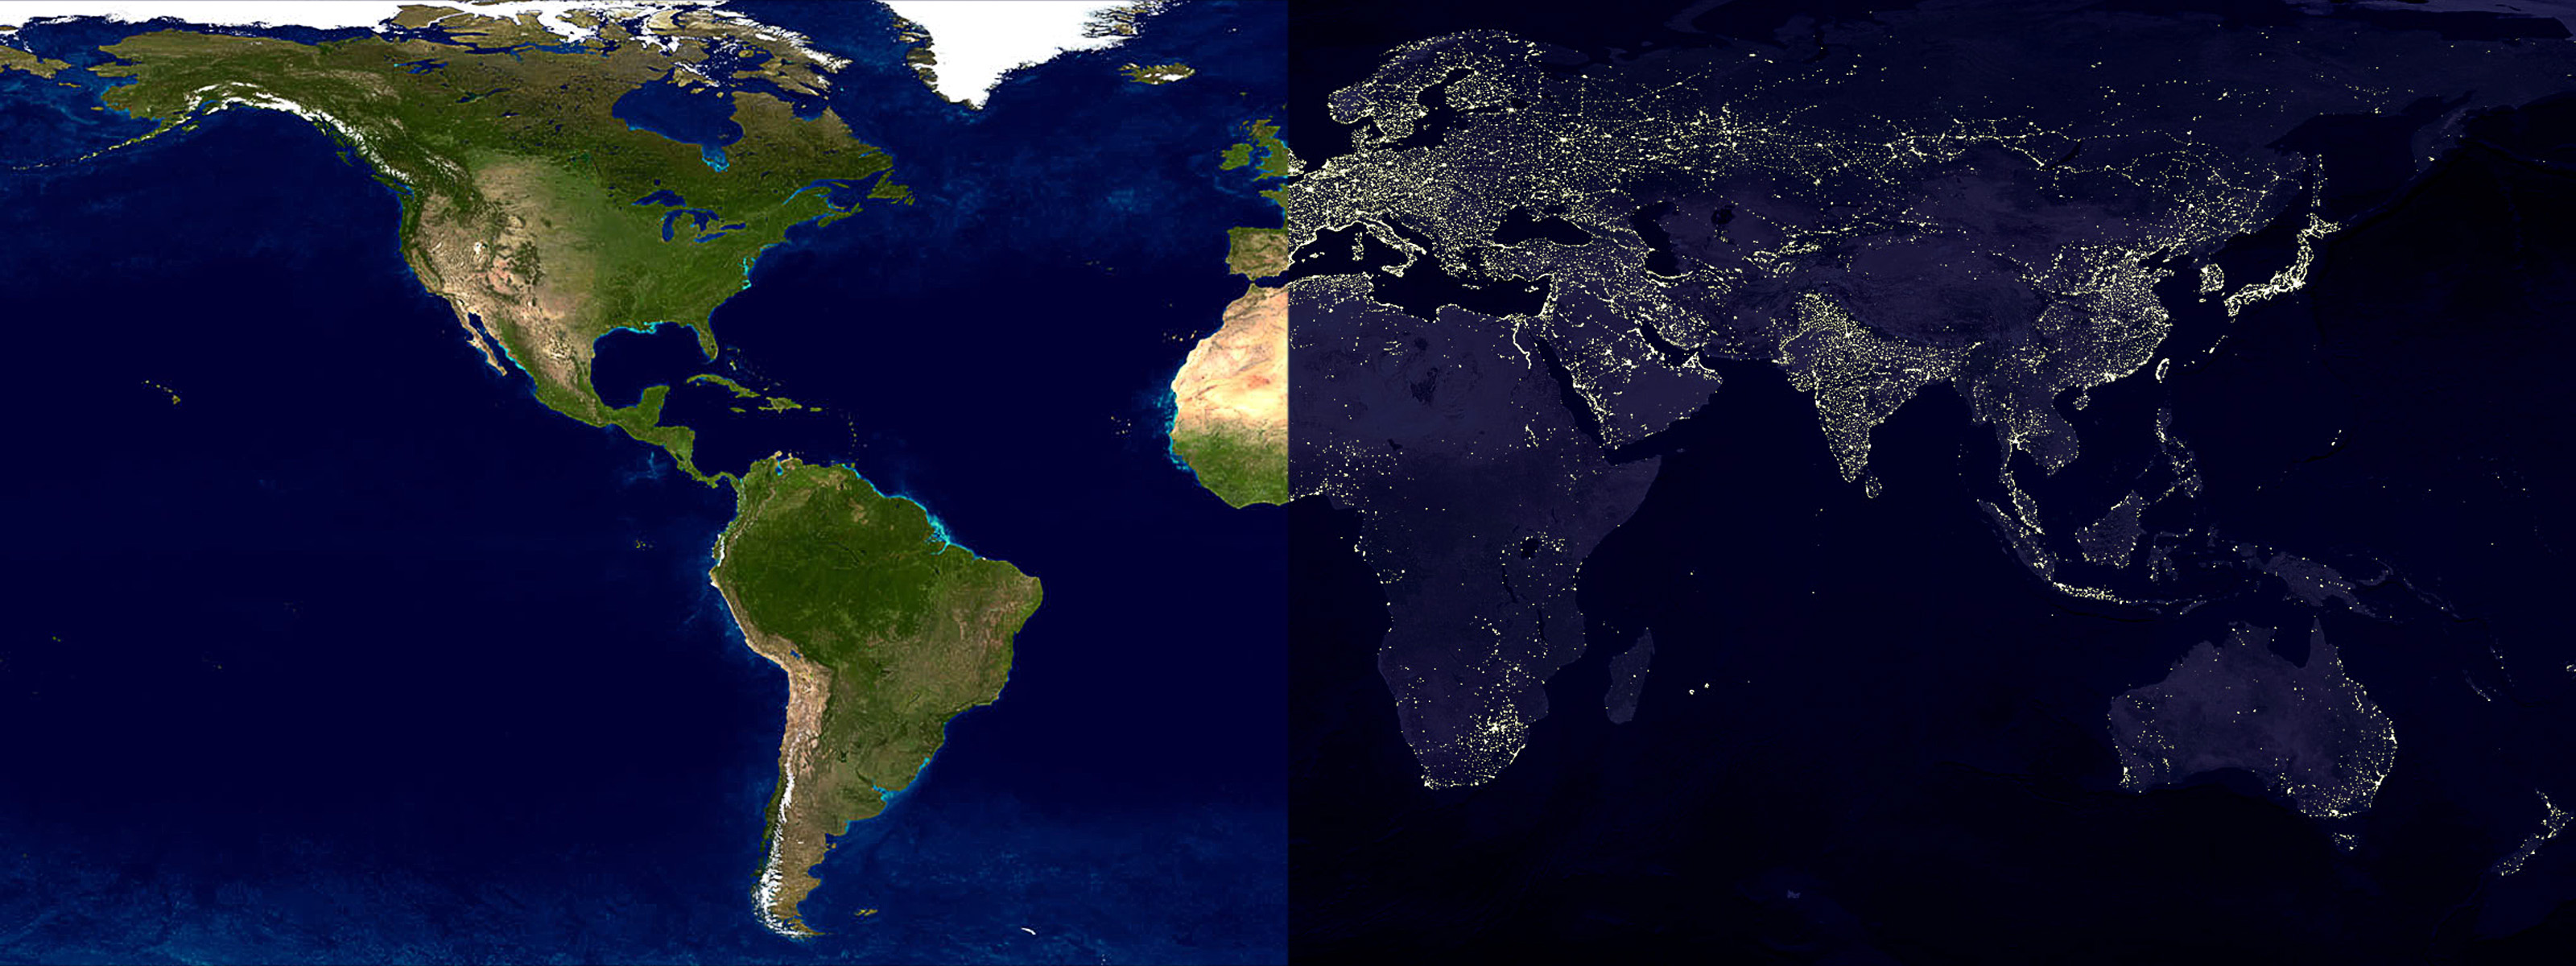 Maps daylight world map nighttime wallpaper 3200x1200 196457 WallpaperUP